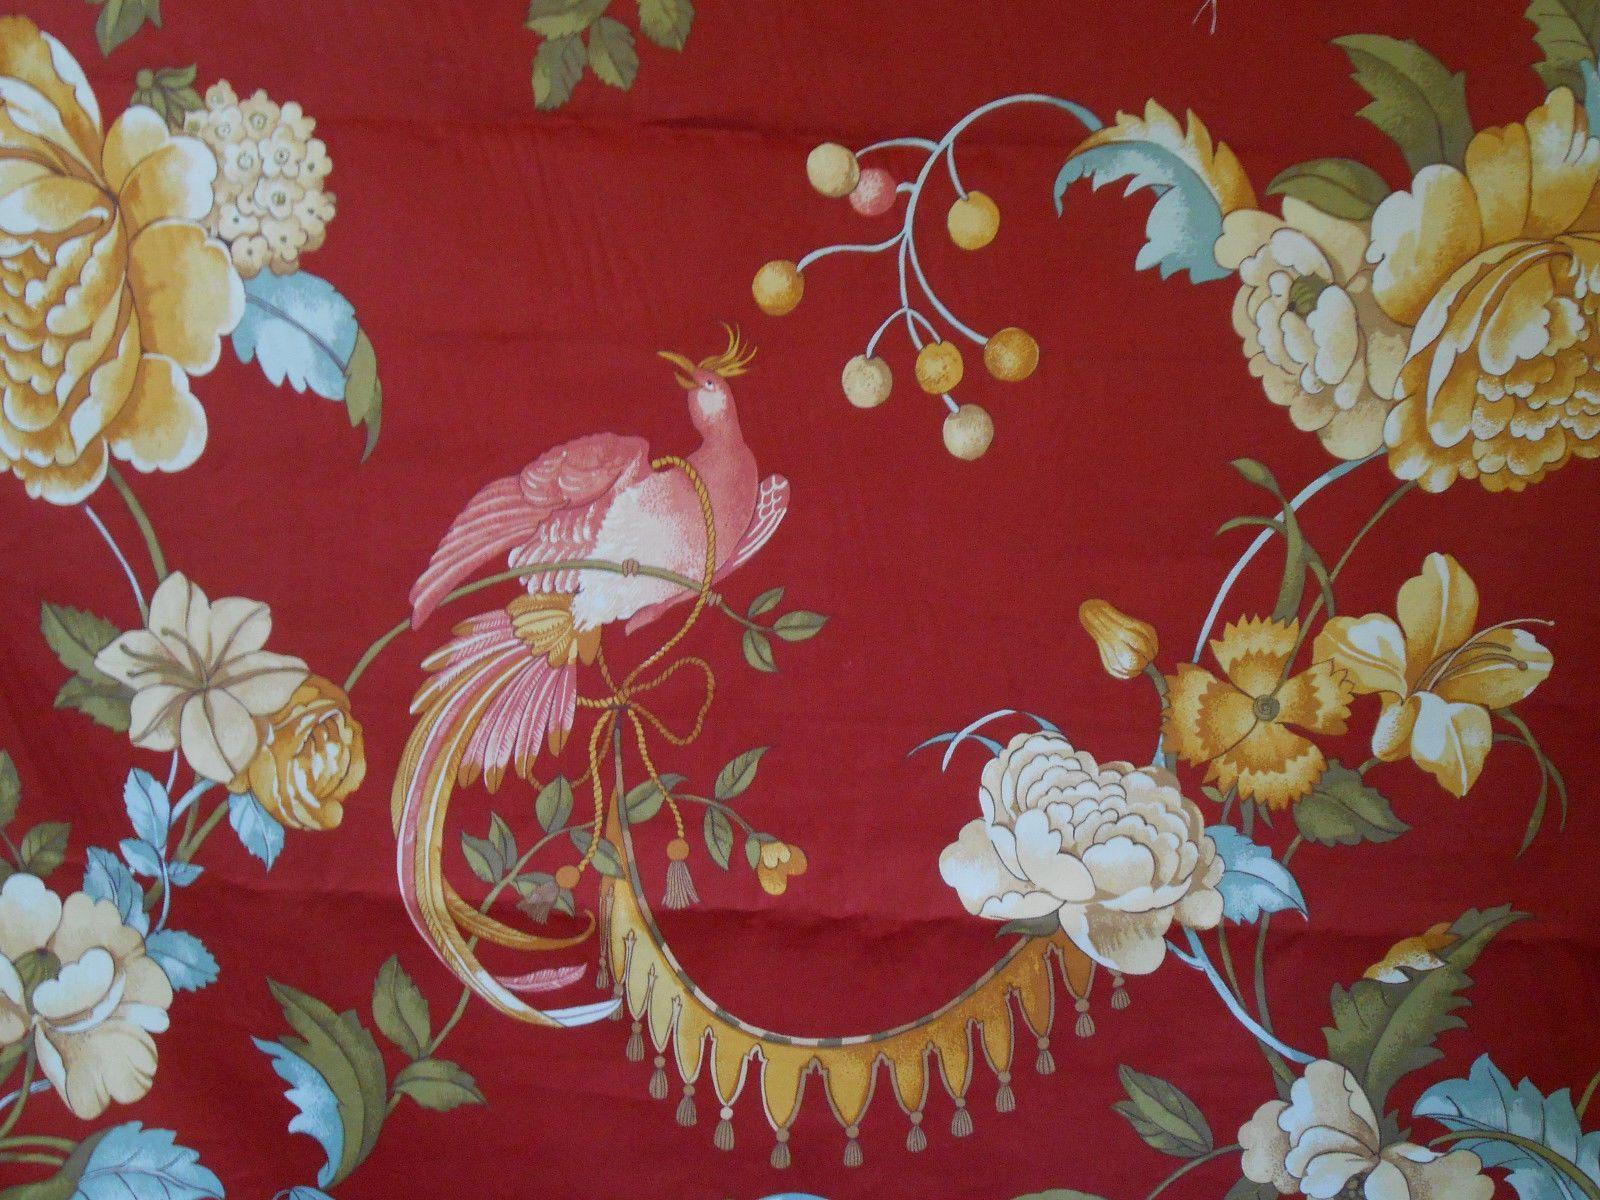 Details About Stroheim Romann Fabric 5 Yards Empress